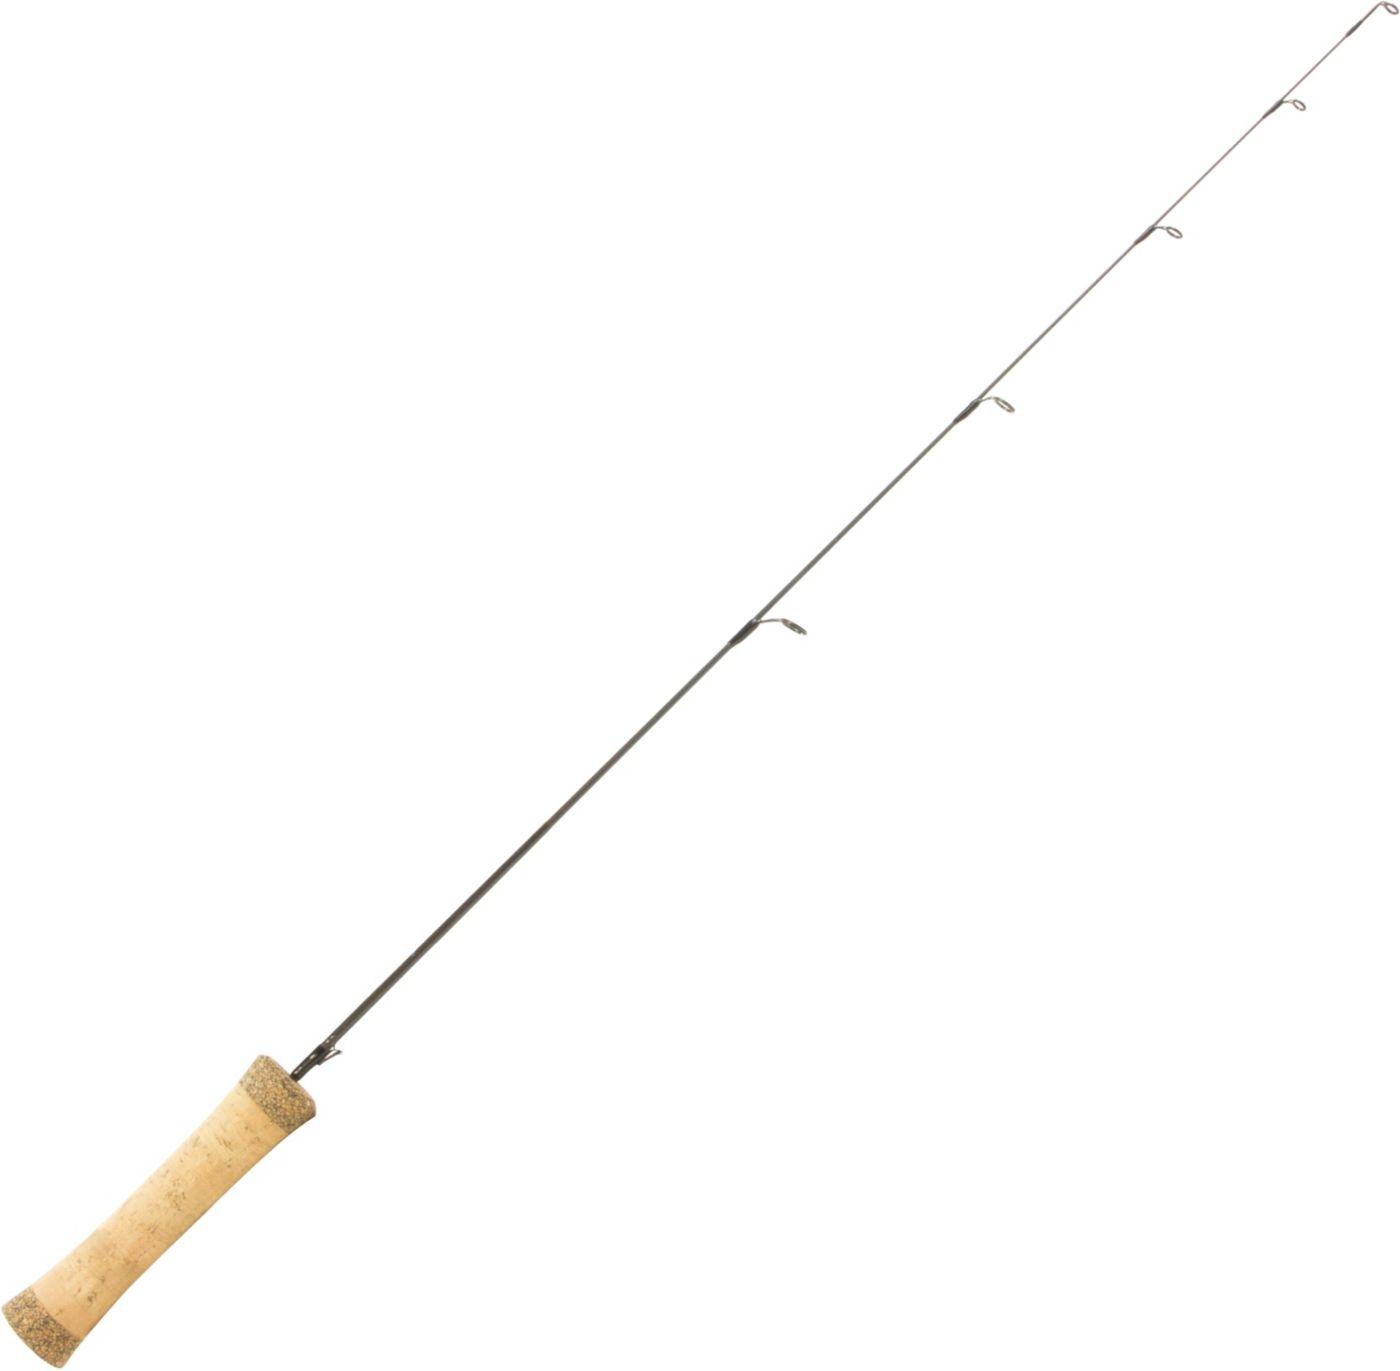 Clam Ice Team Professional Zippy Dahl Perch Ice Fishing Rod